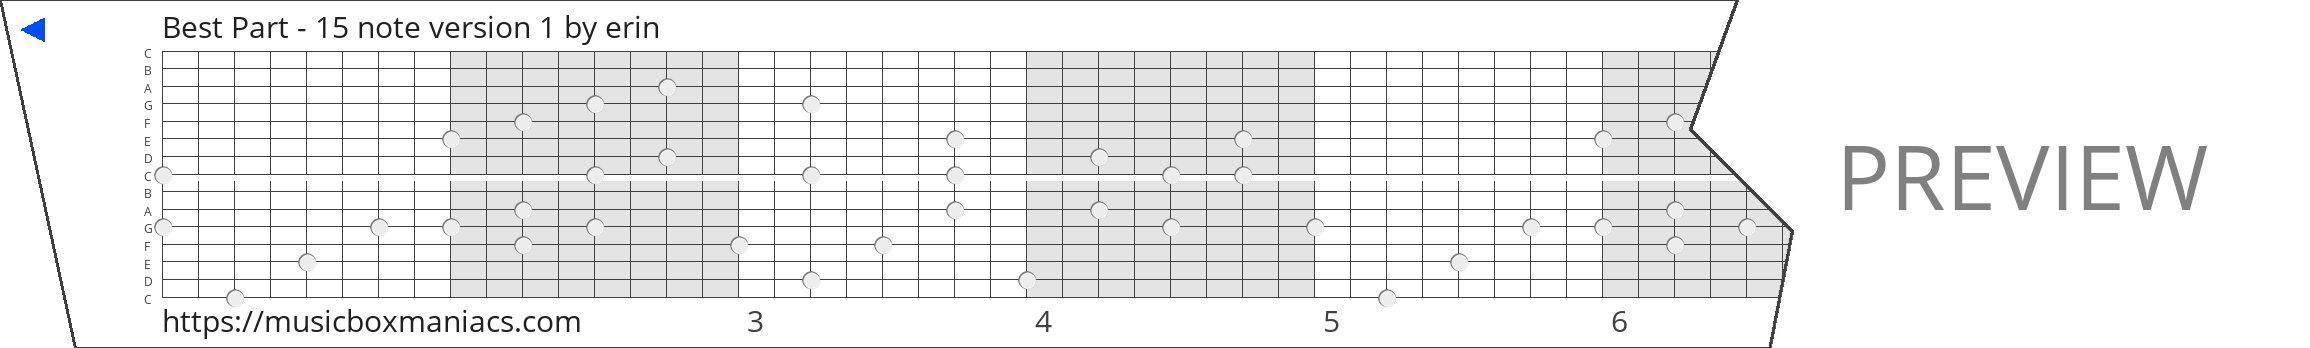 Best Part - 15 note version 1 15 note music box paper strip